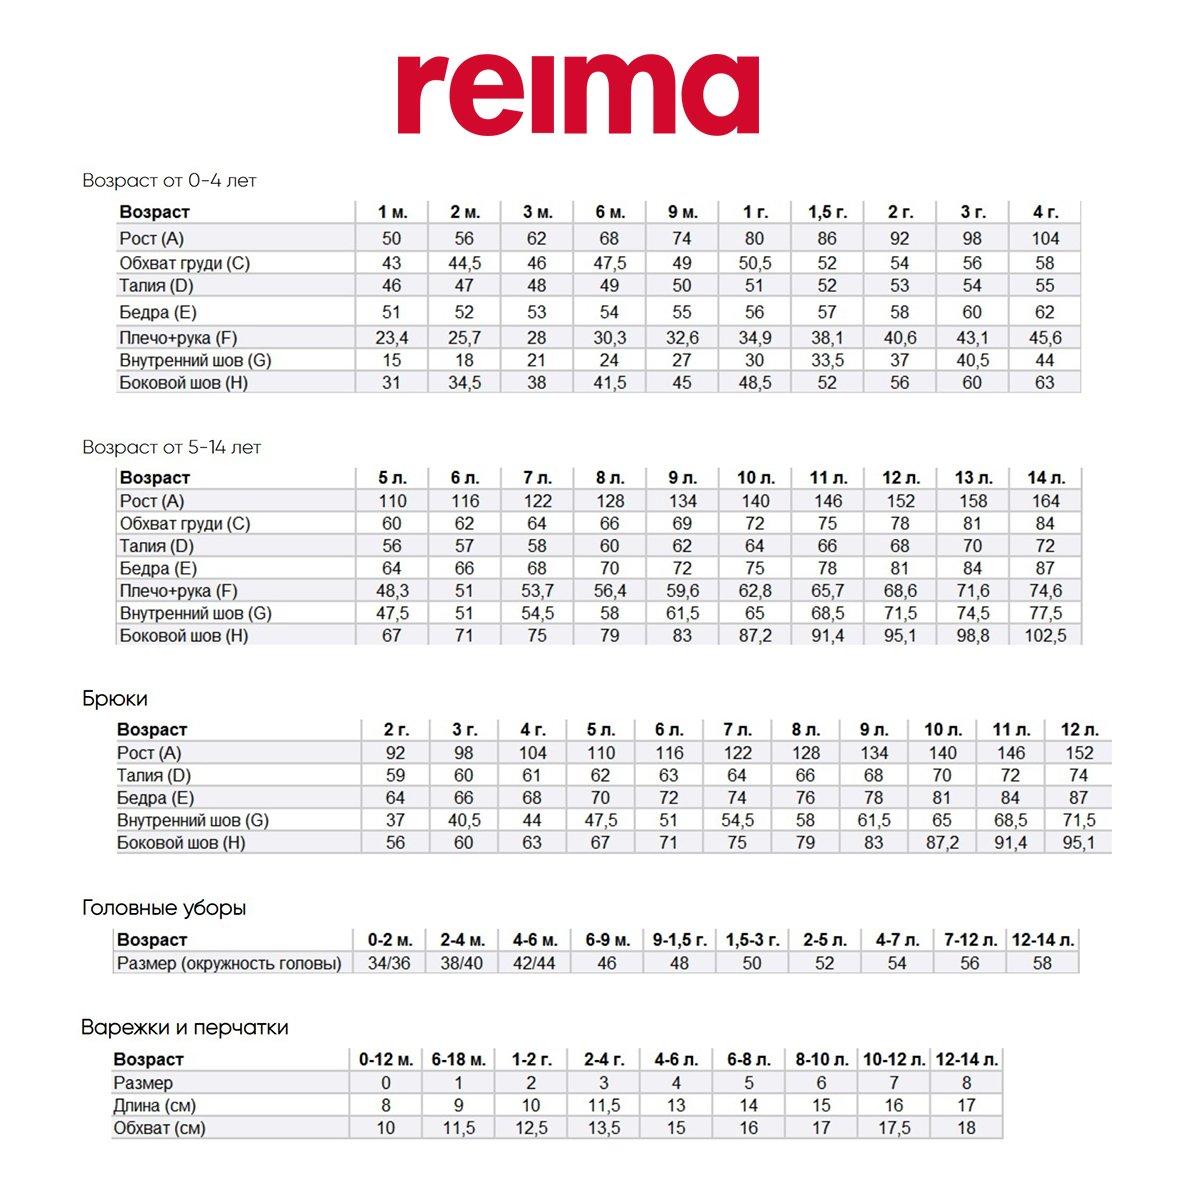 Купить Верхняя одежда, Куртка Lassie by Reima Green, р. 110 721757R-2251 ТМ: LASSIE by reima, серый с зеленым